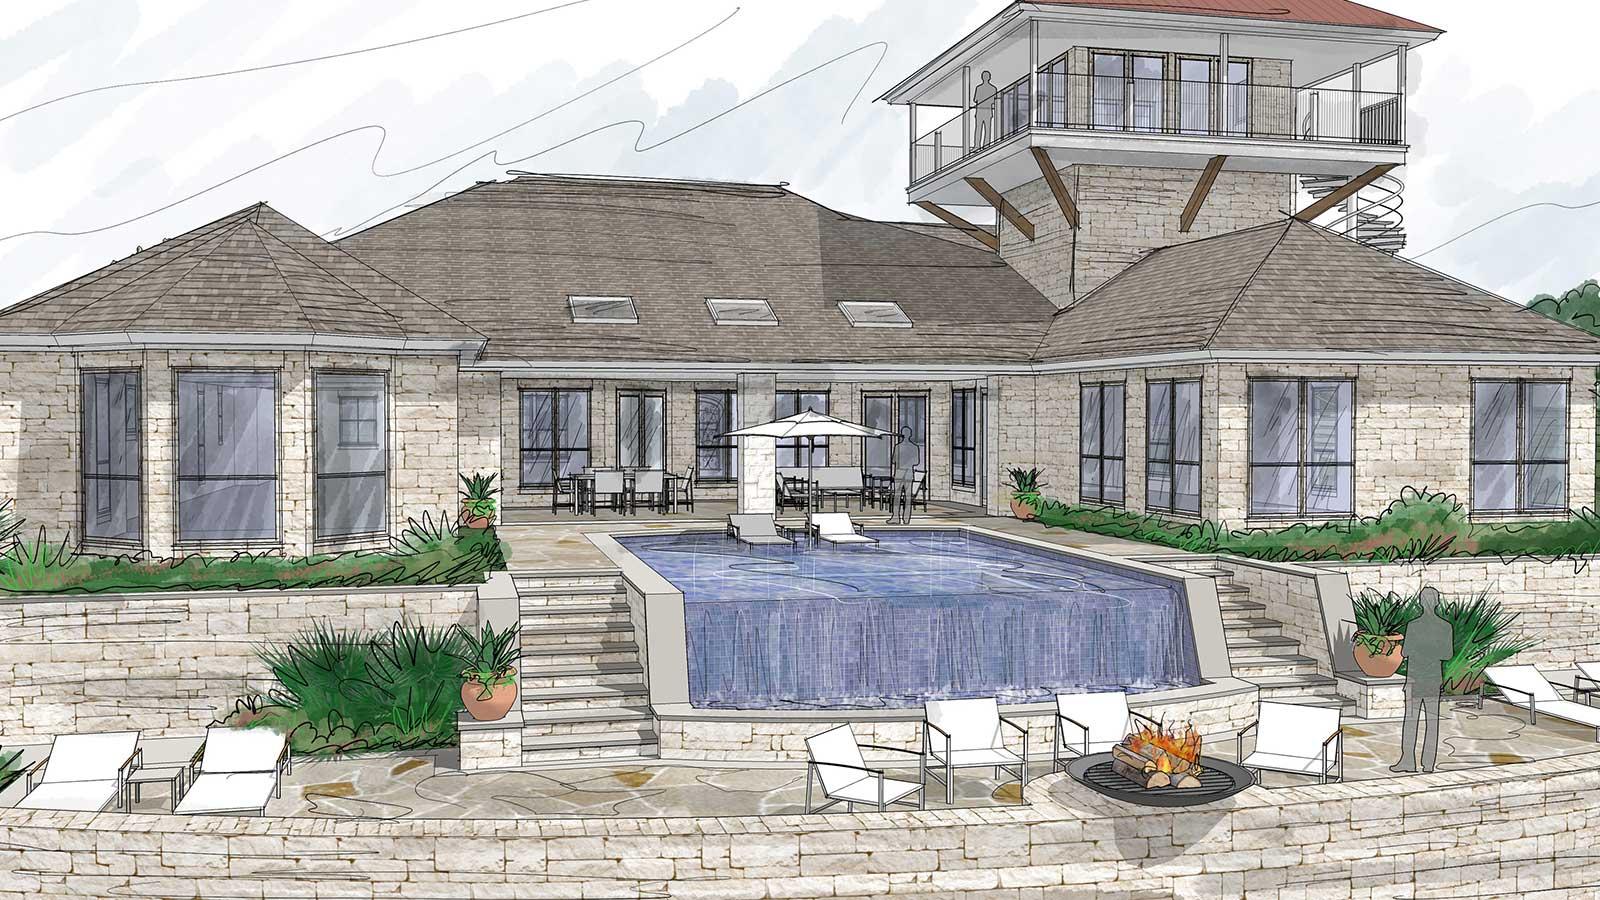 ddla-design-ranch-house-sketch.jpg